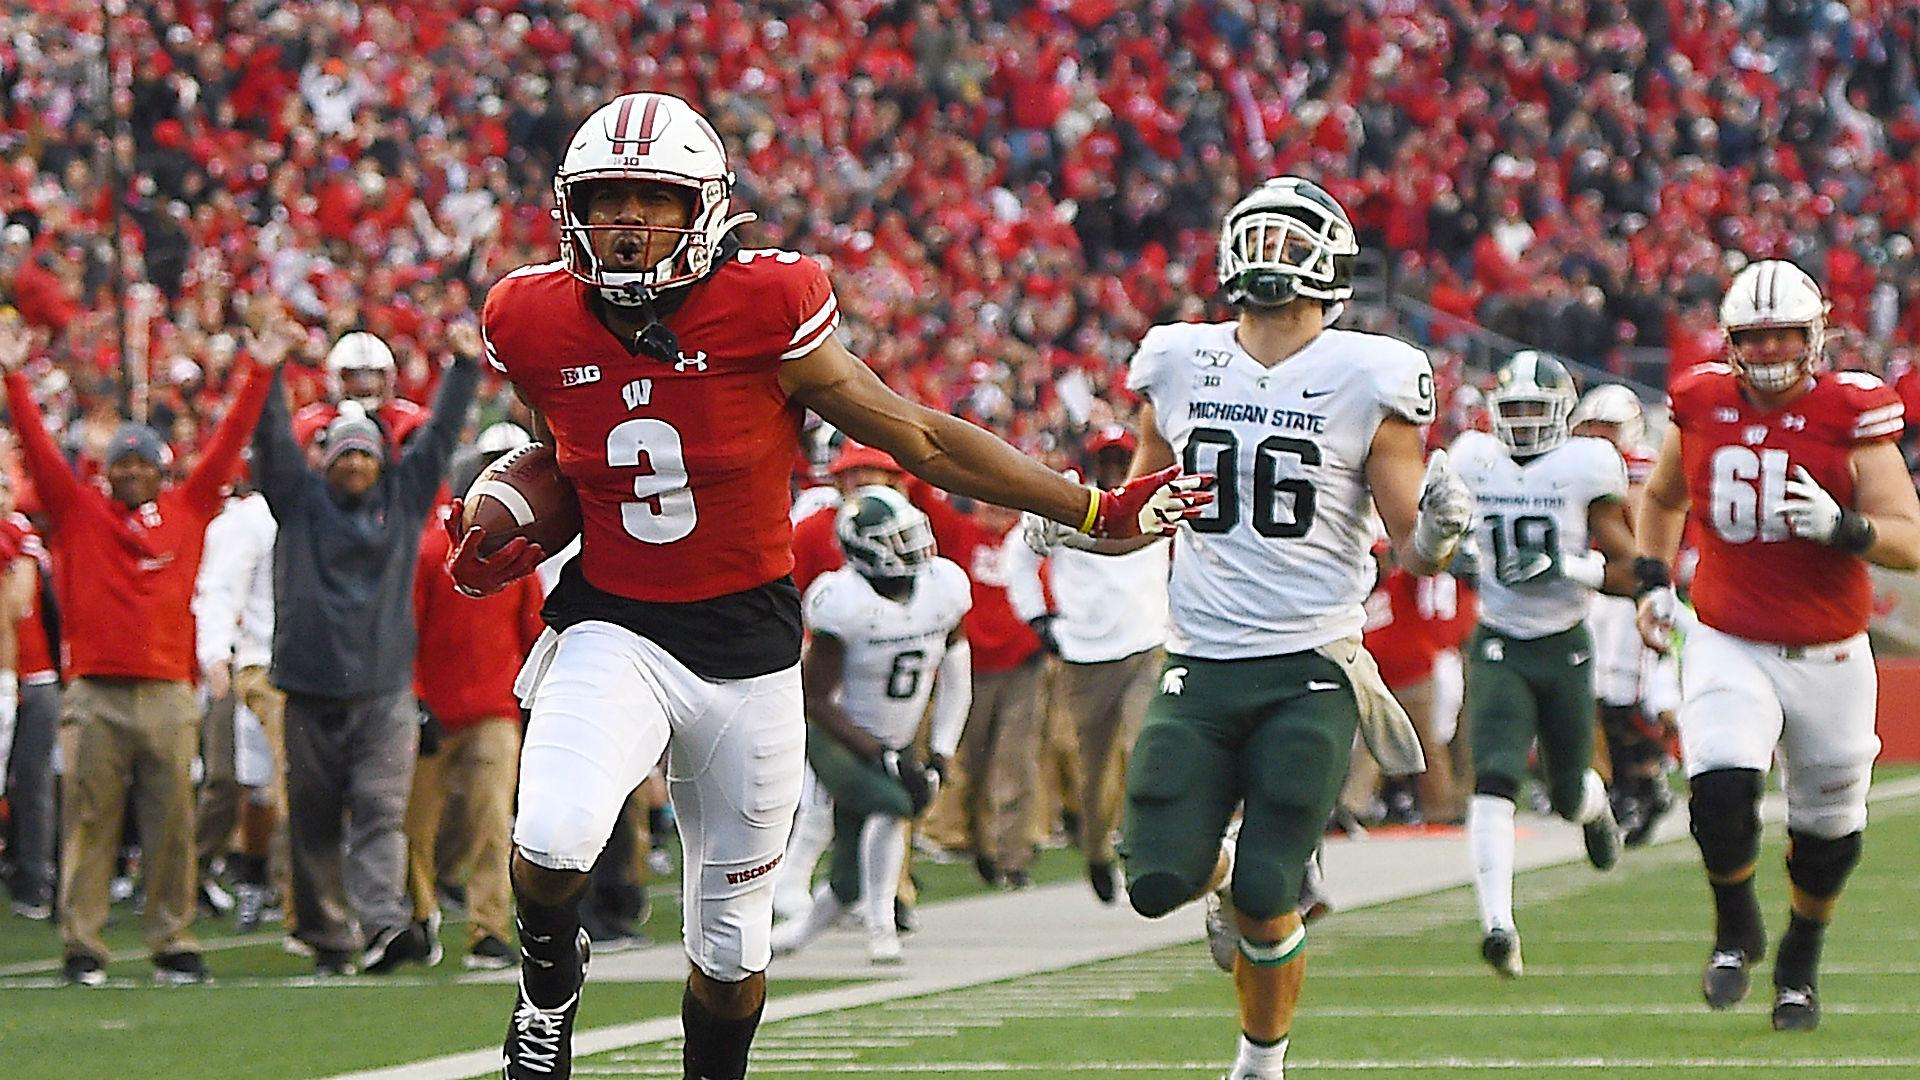 ap top 25 poll college football